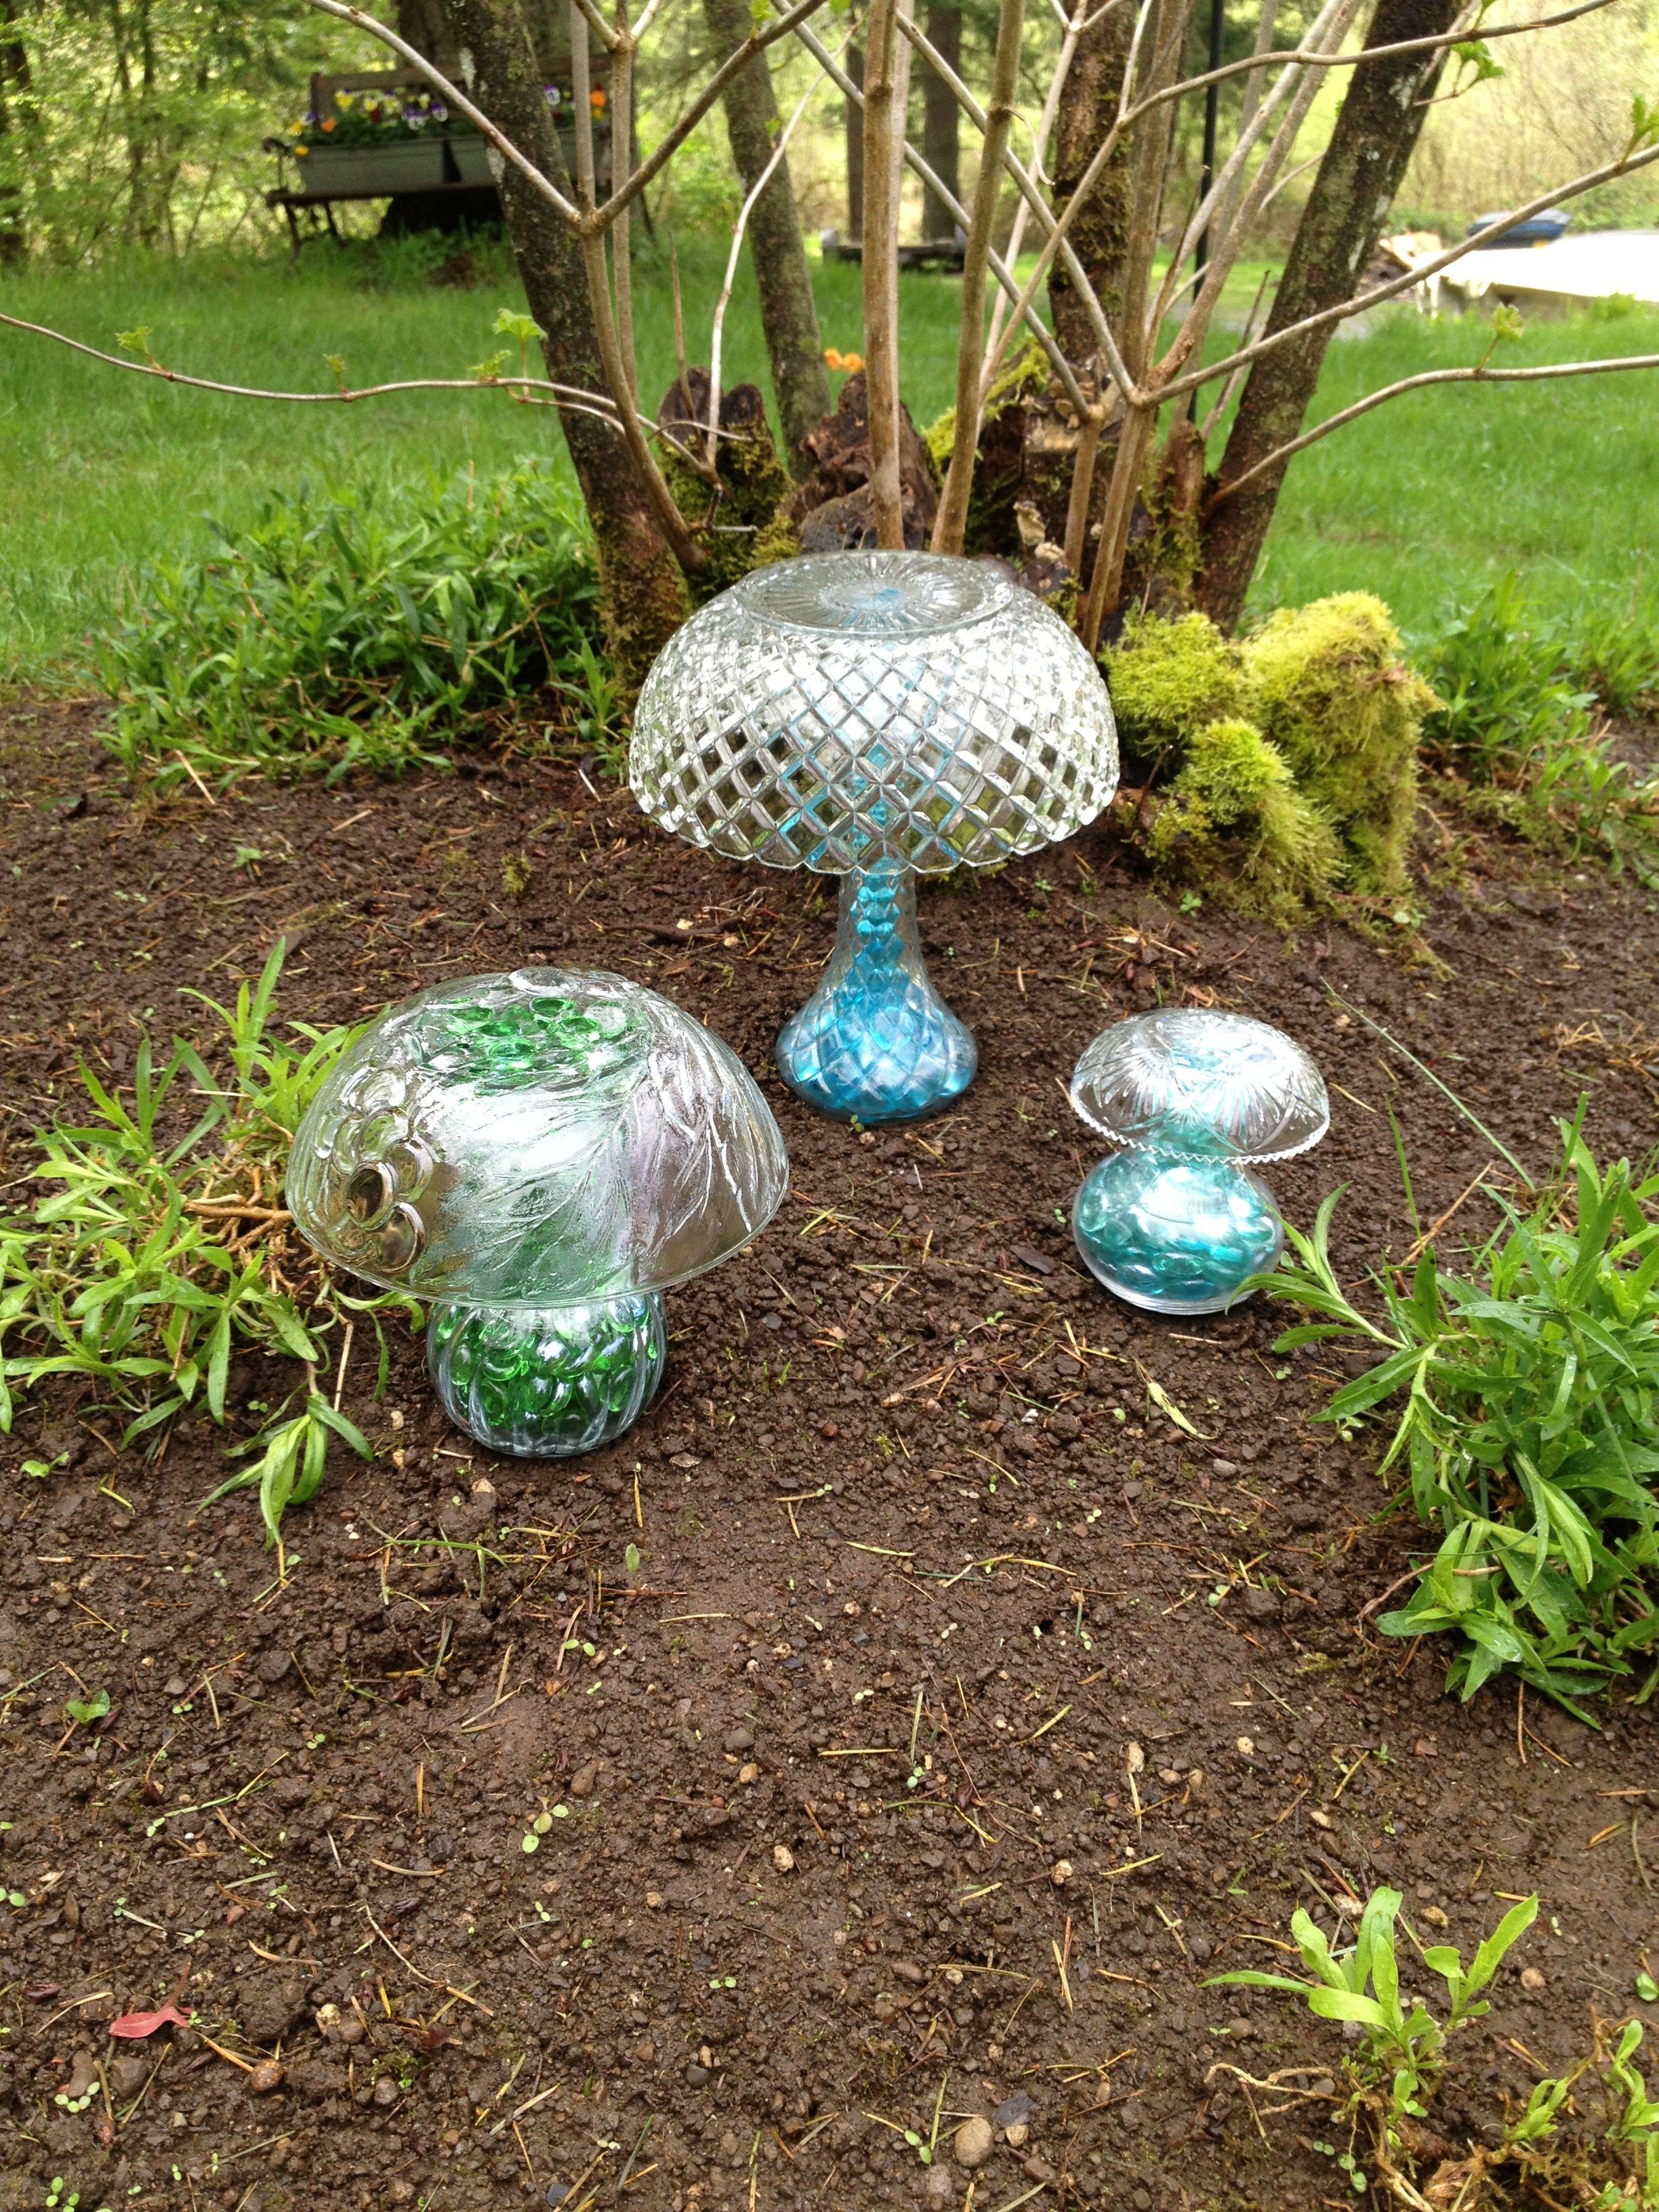 Antiques Diy Mushrooms Lawn Decor Upcycle Garden Crafts Garden Art Glass Garden